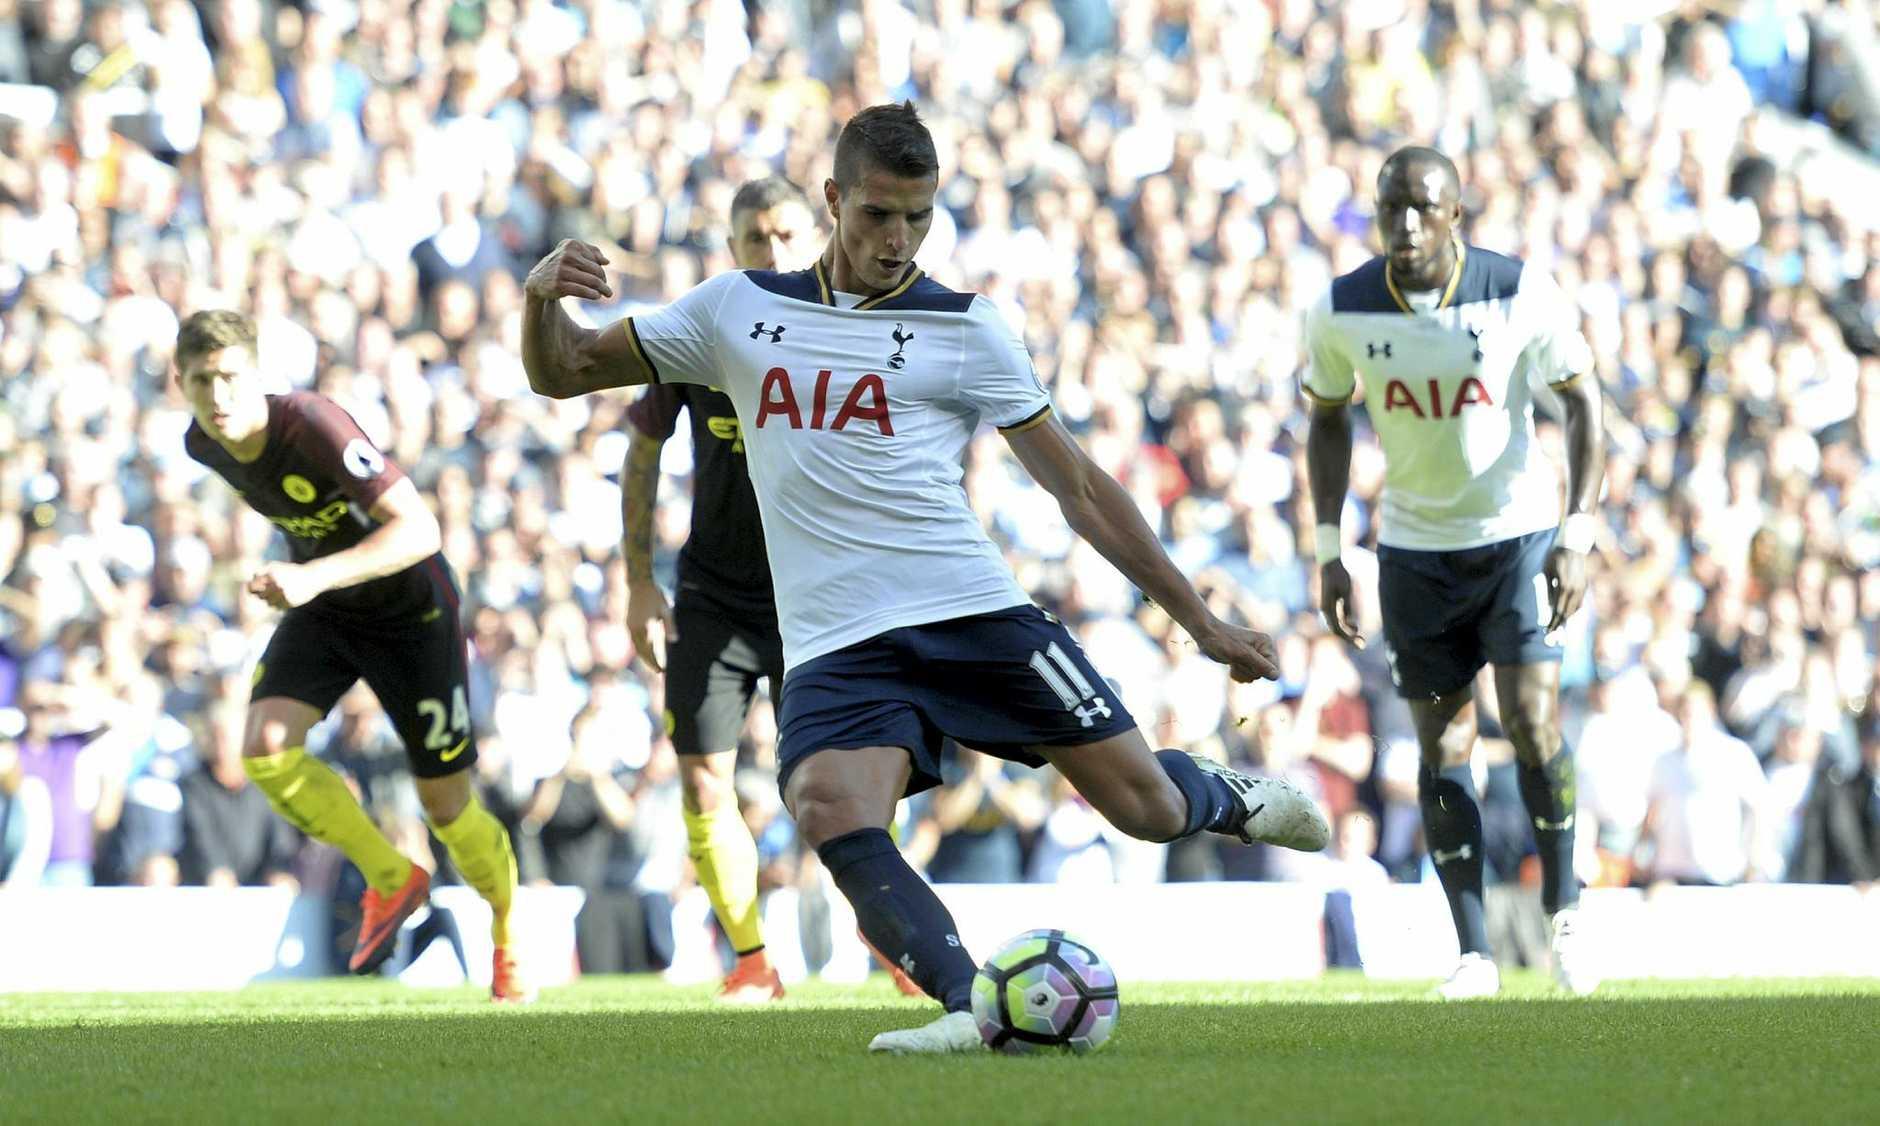 Tottenham's Erik Lamela takes a penalty against Manchester City in October.